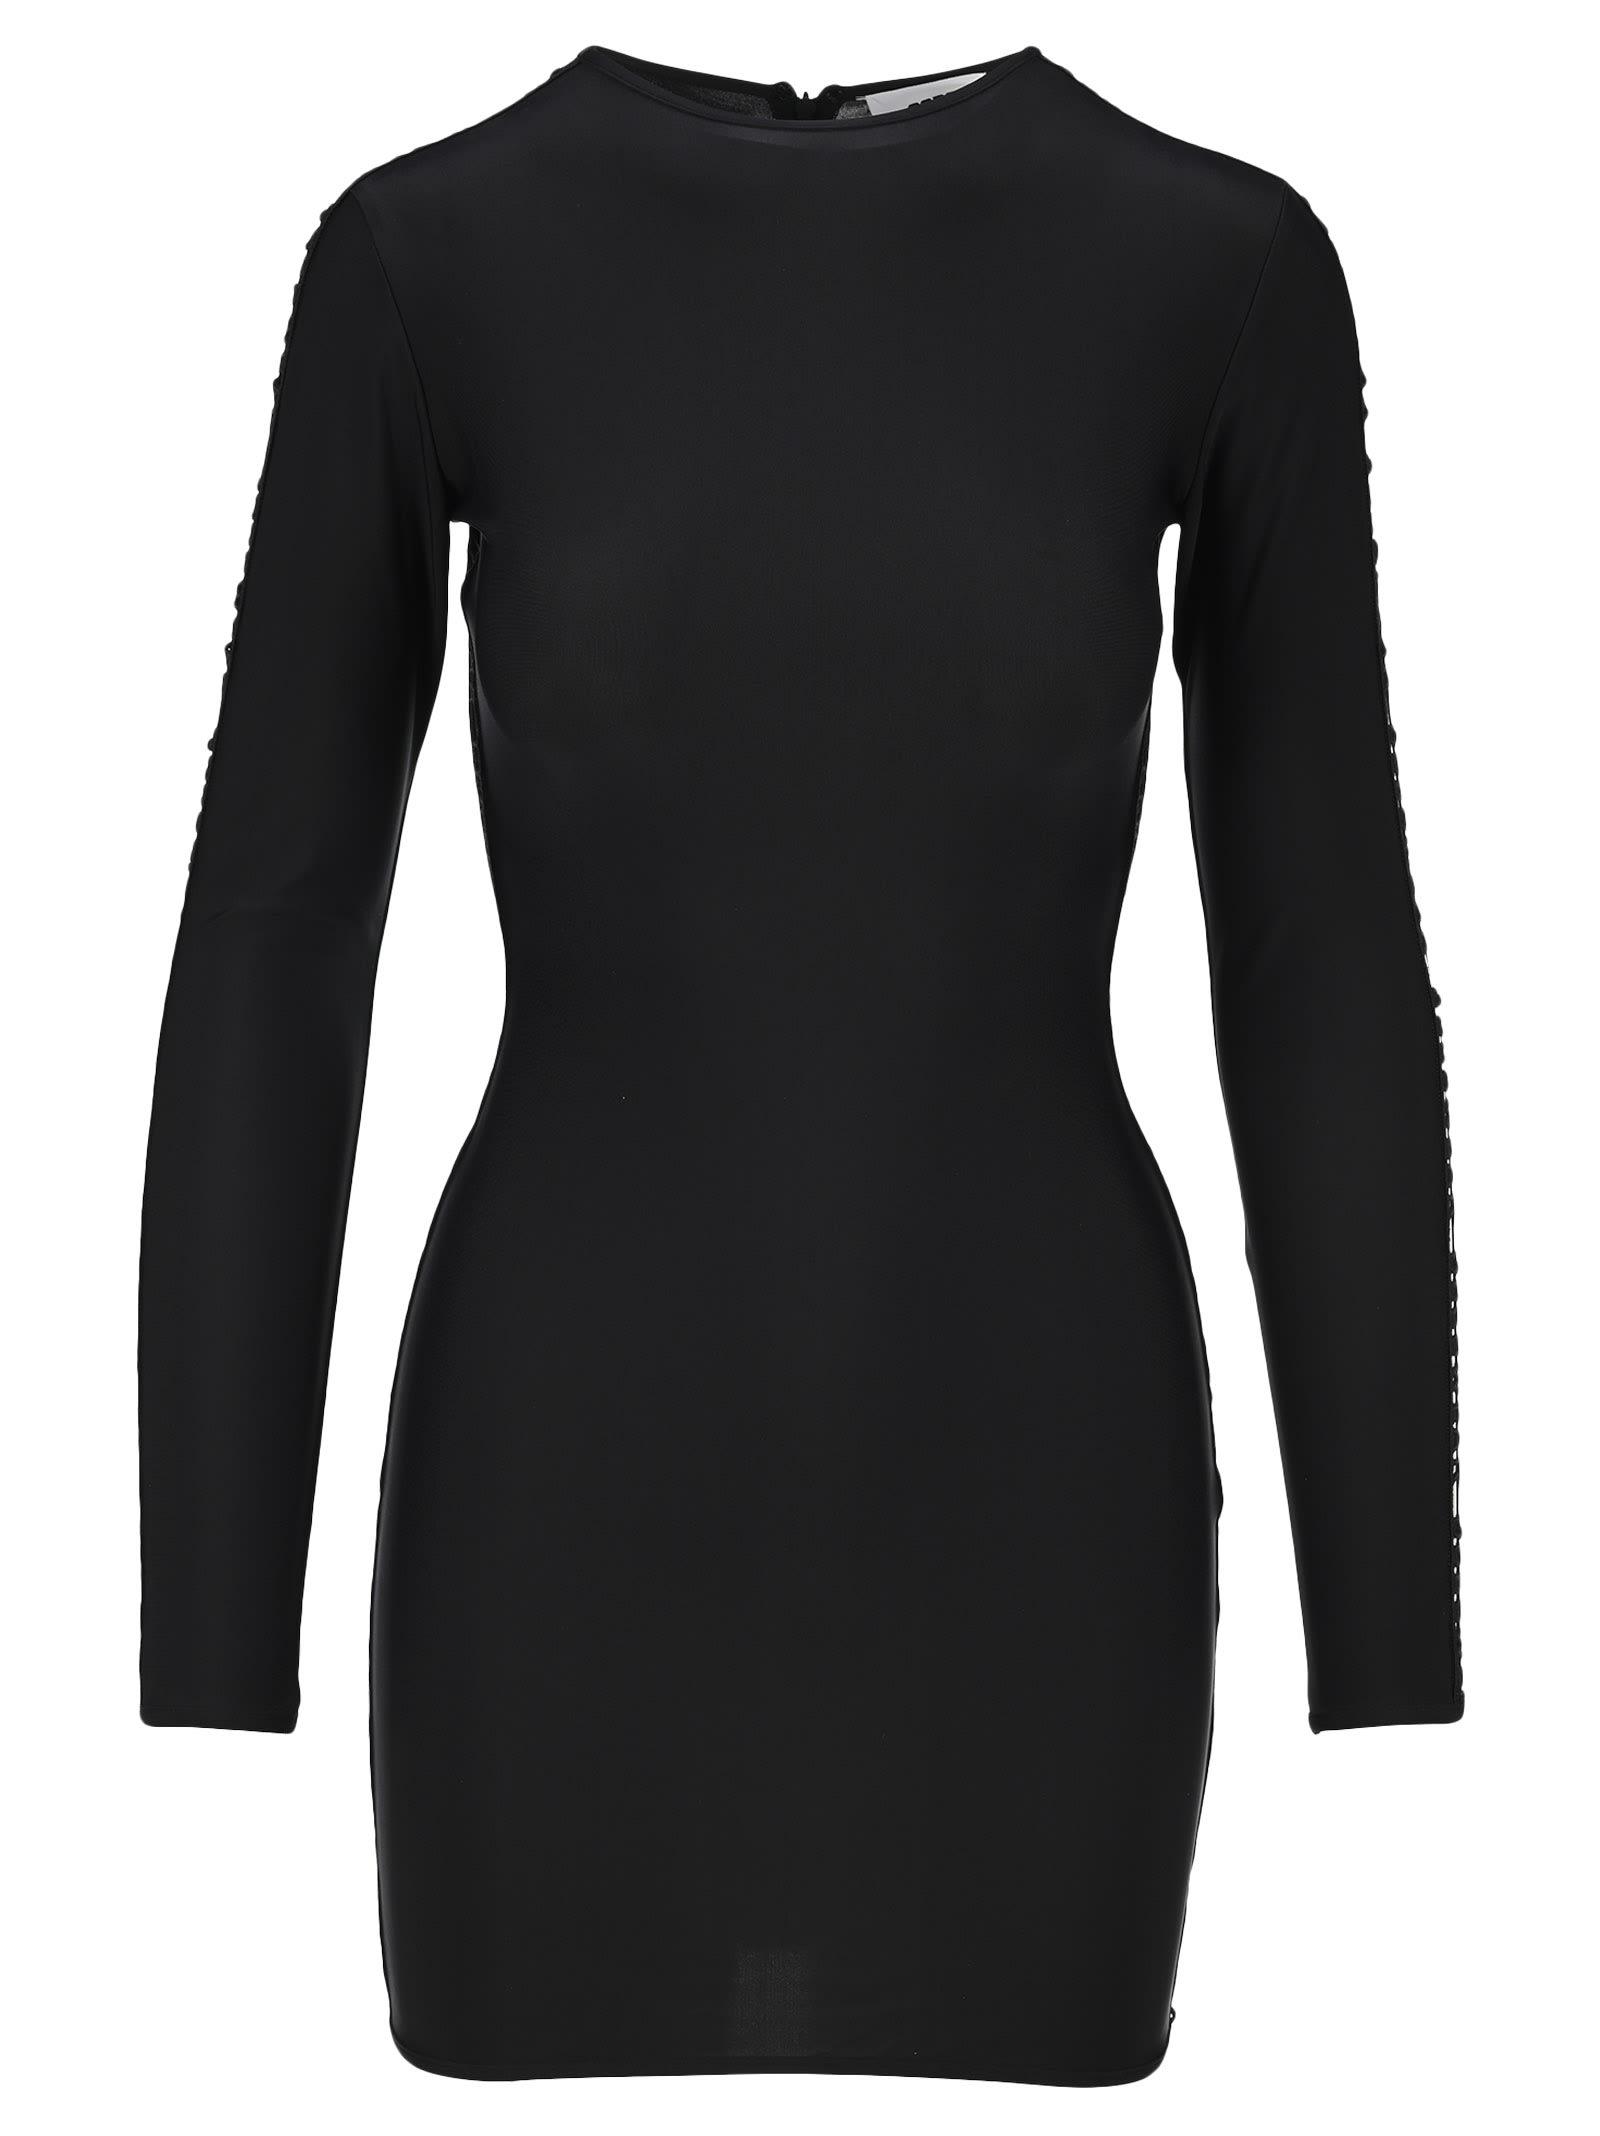 Gcds Embroidered Logo Mini Dress